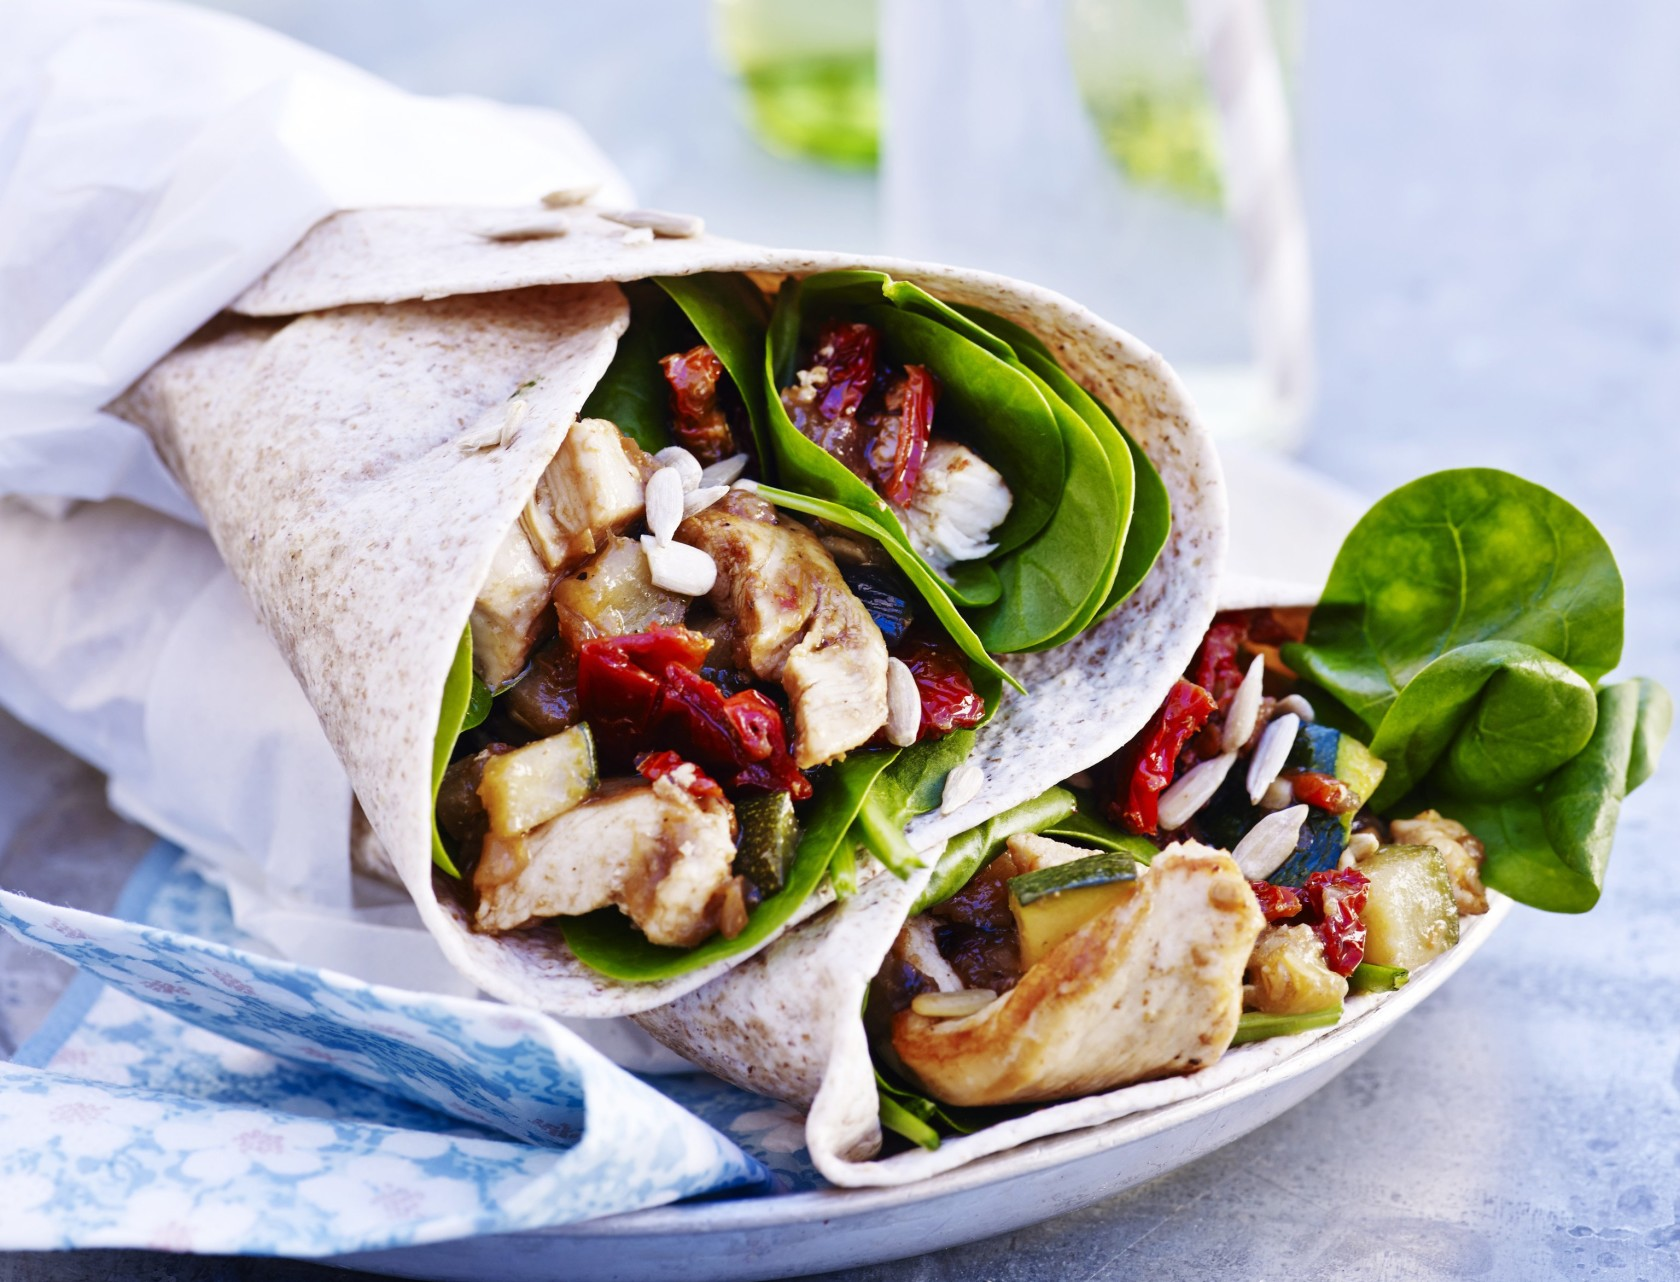 Wraps med grøntsagsfyld og kylling er perfekt til madpakken eller picnicen, da den nemt kan medbringes.